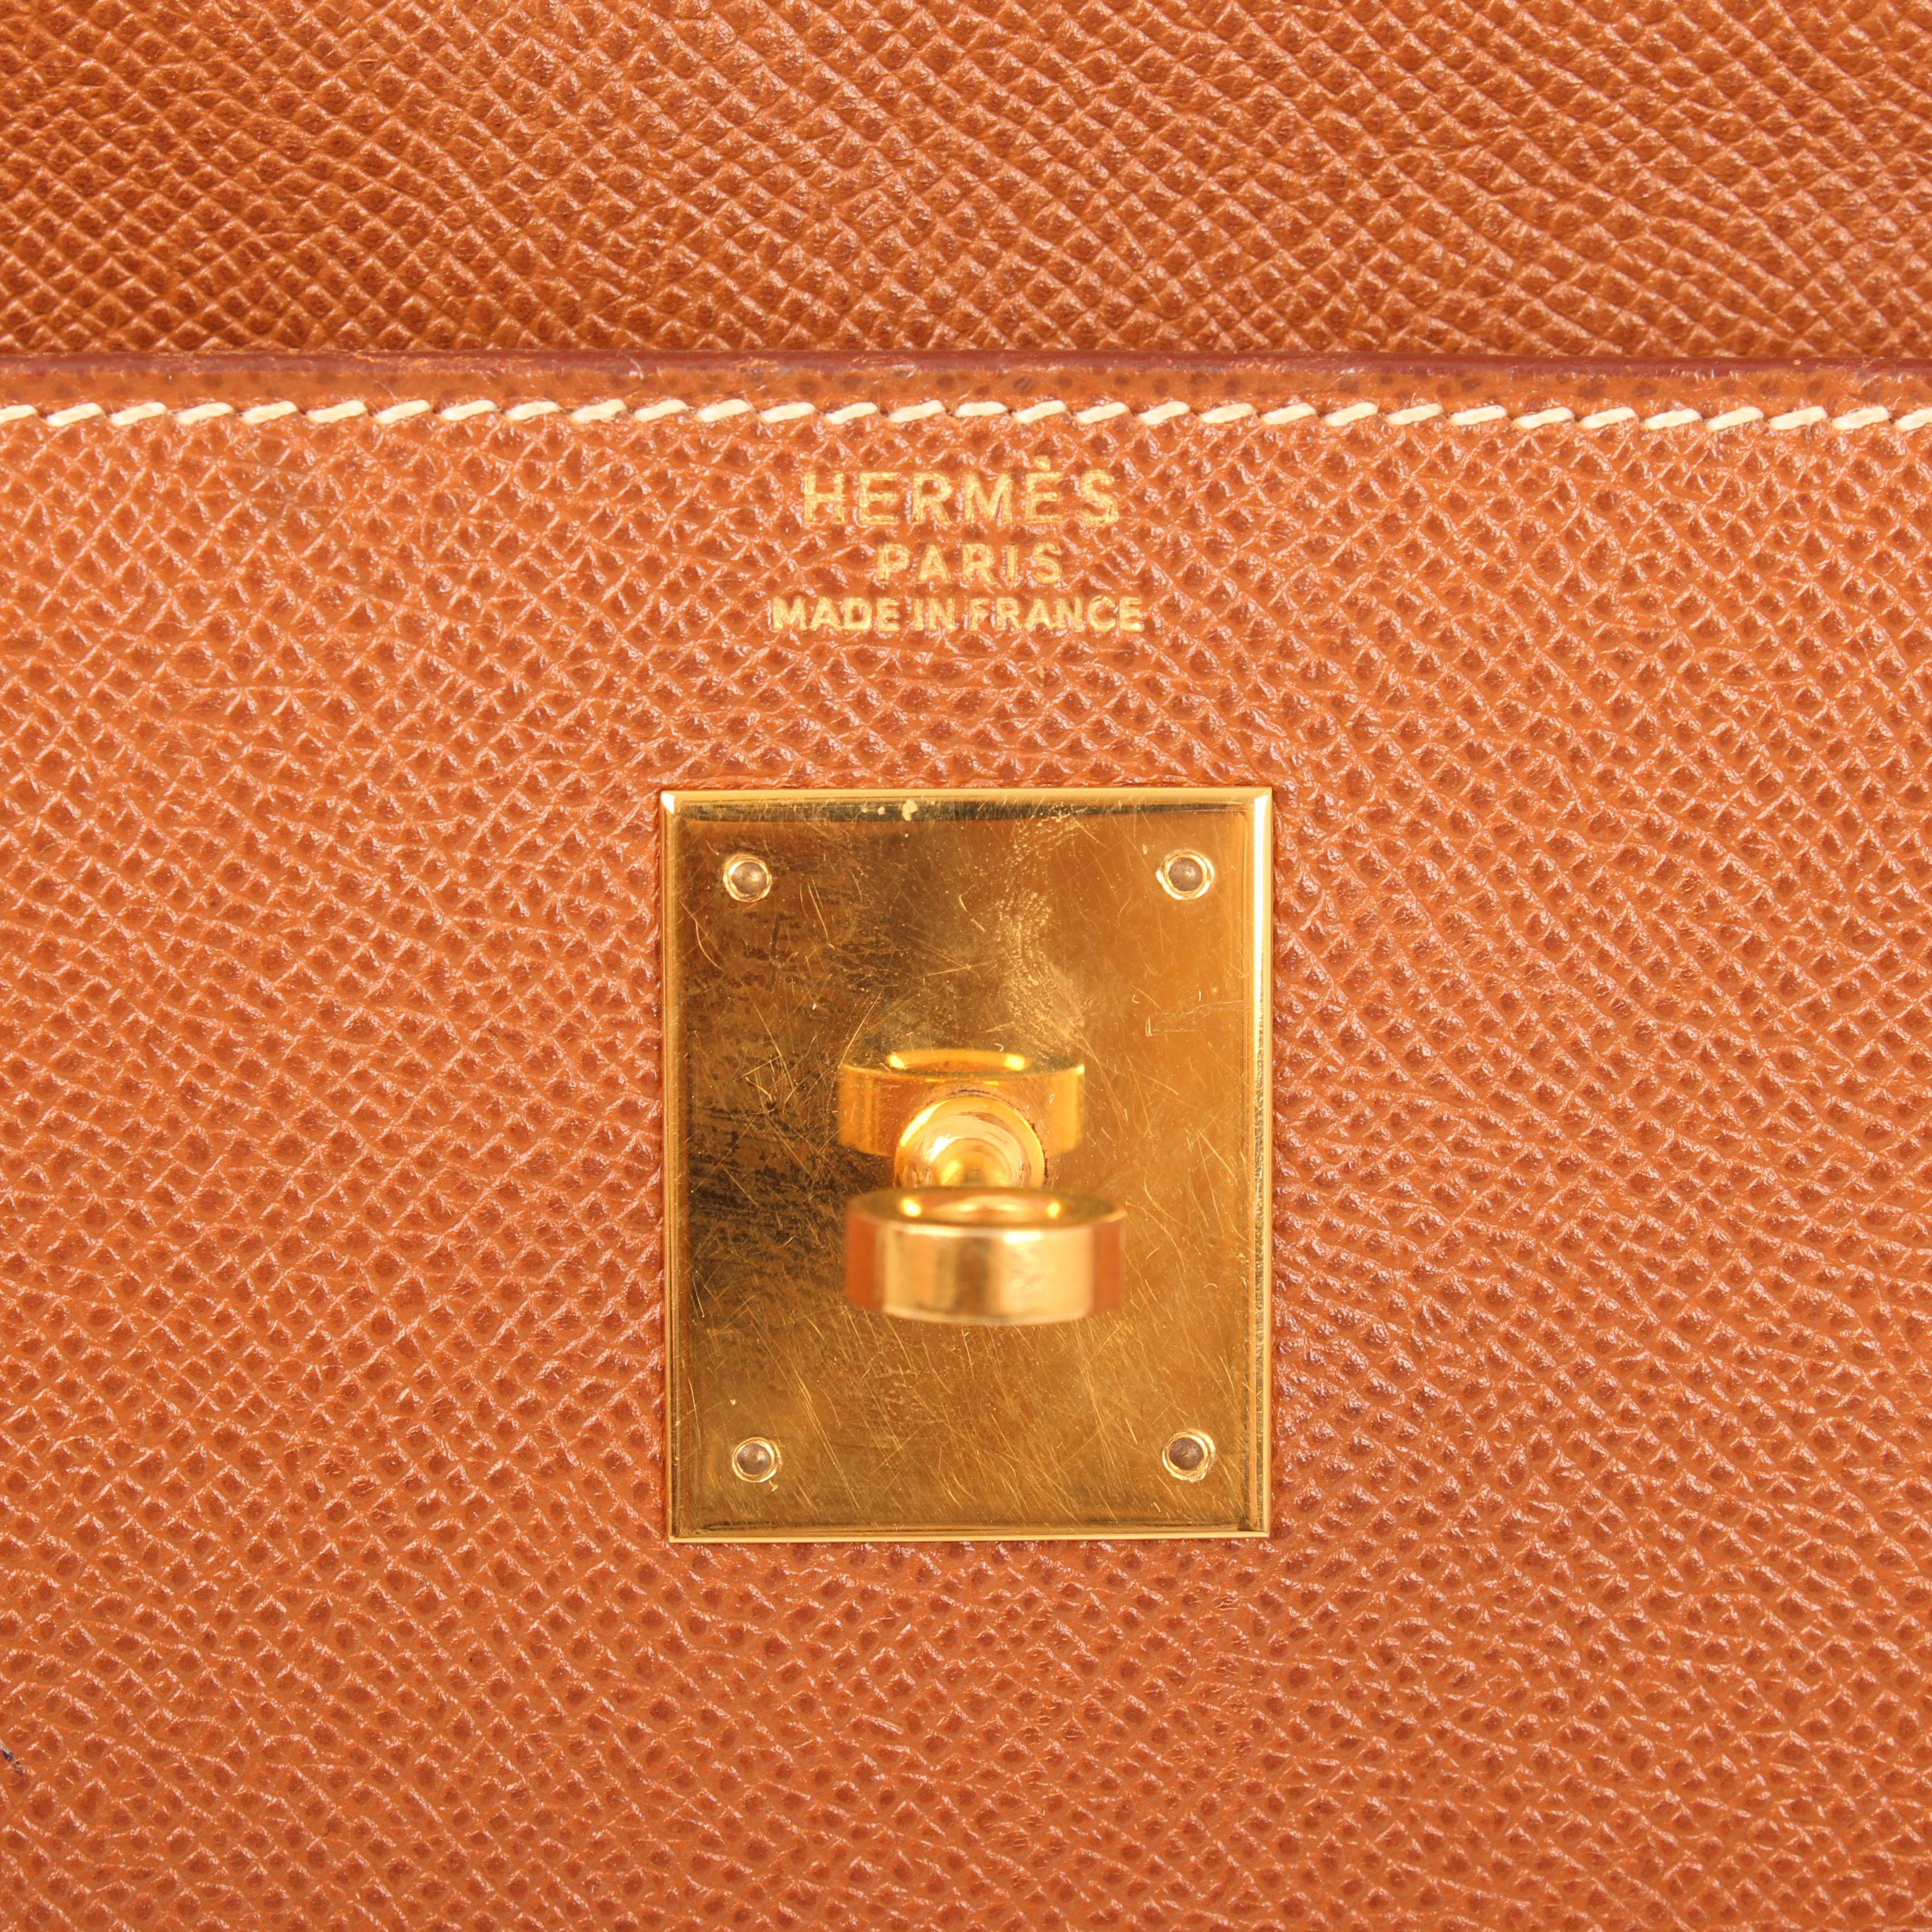 bolso hermes kelly 32 gold sellier piel epsom marca